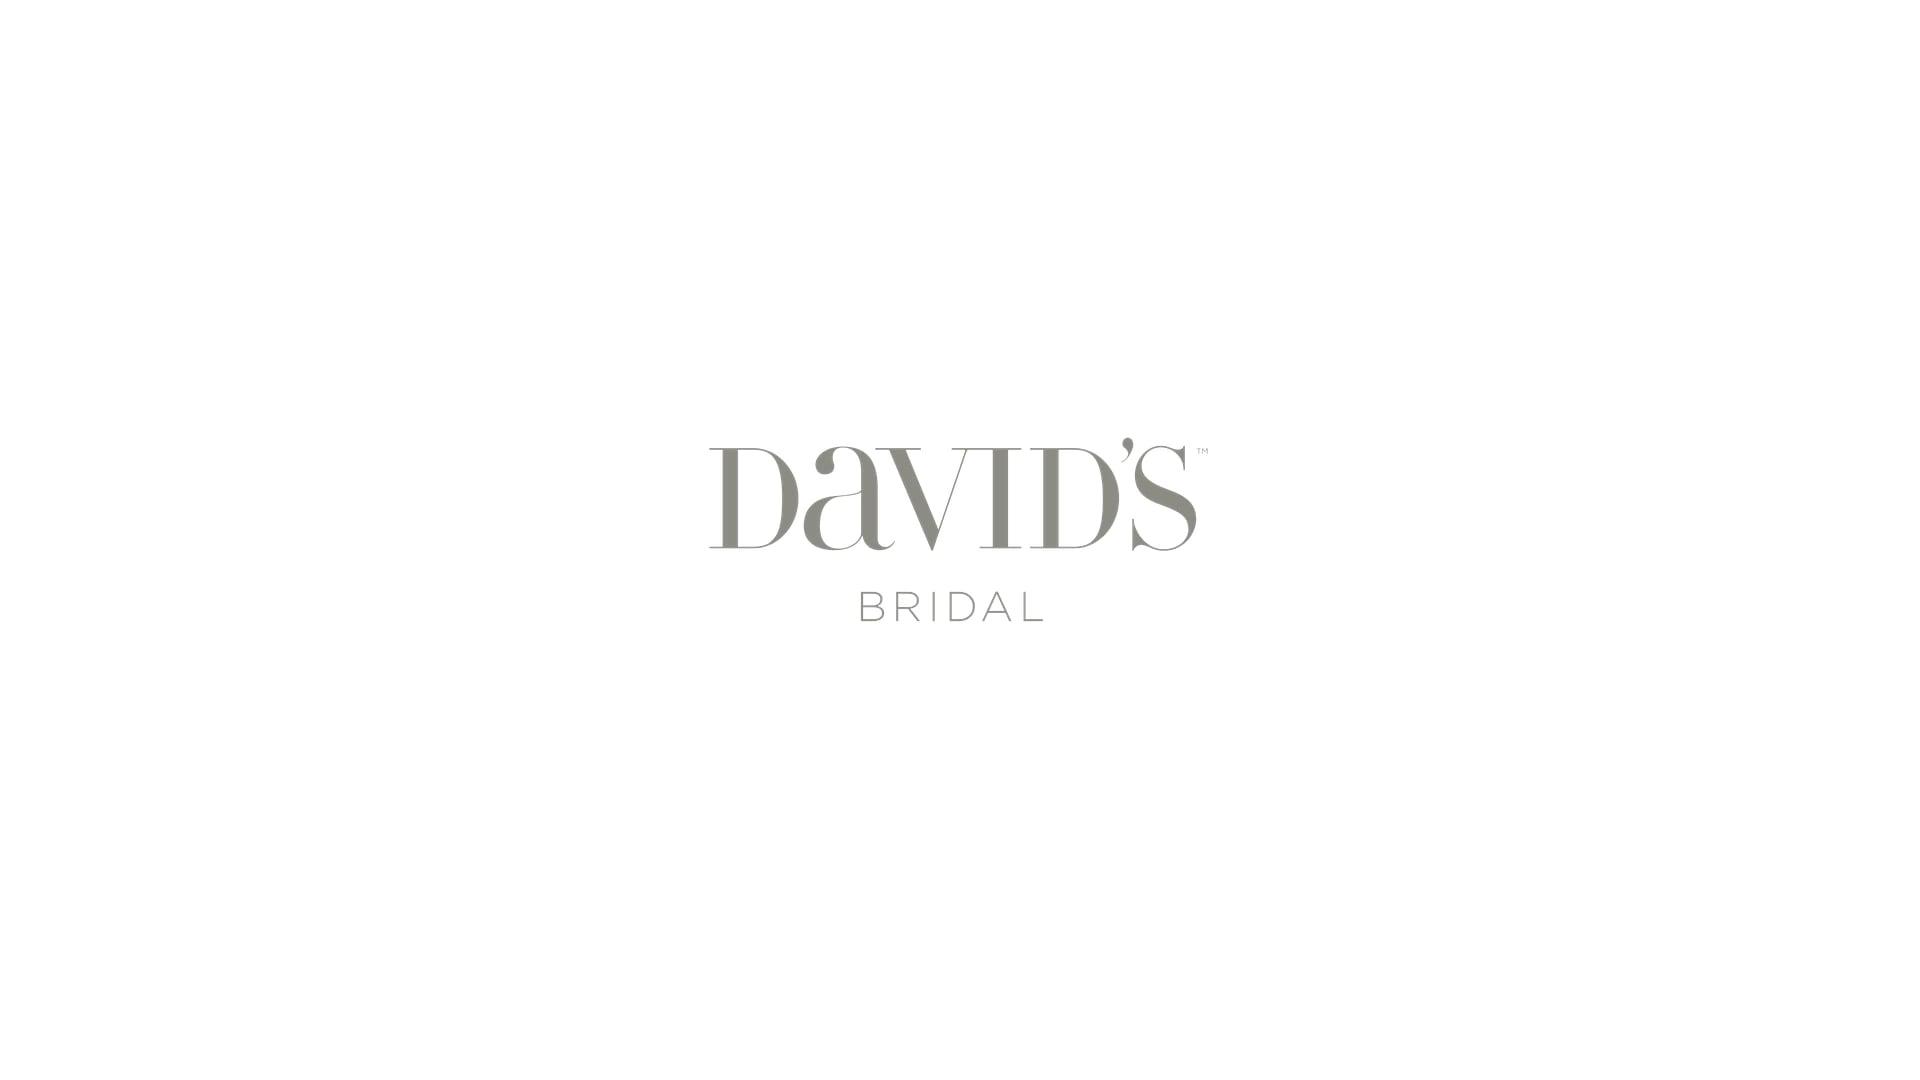 David's Bridal Spring 15'